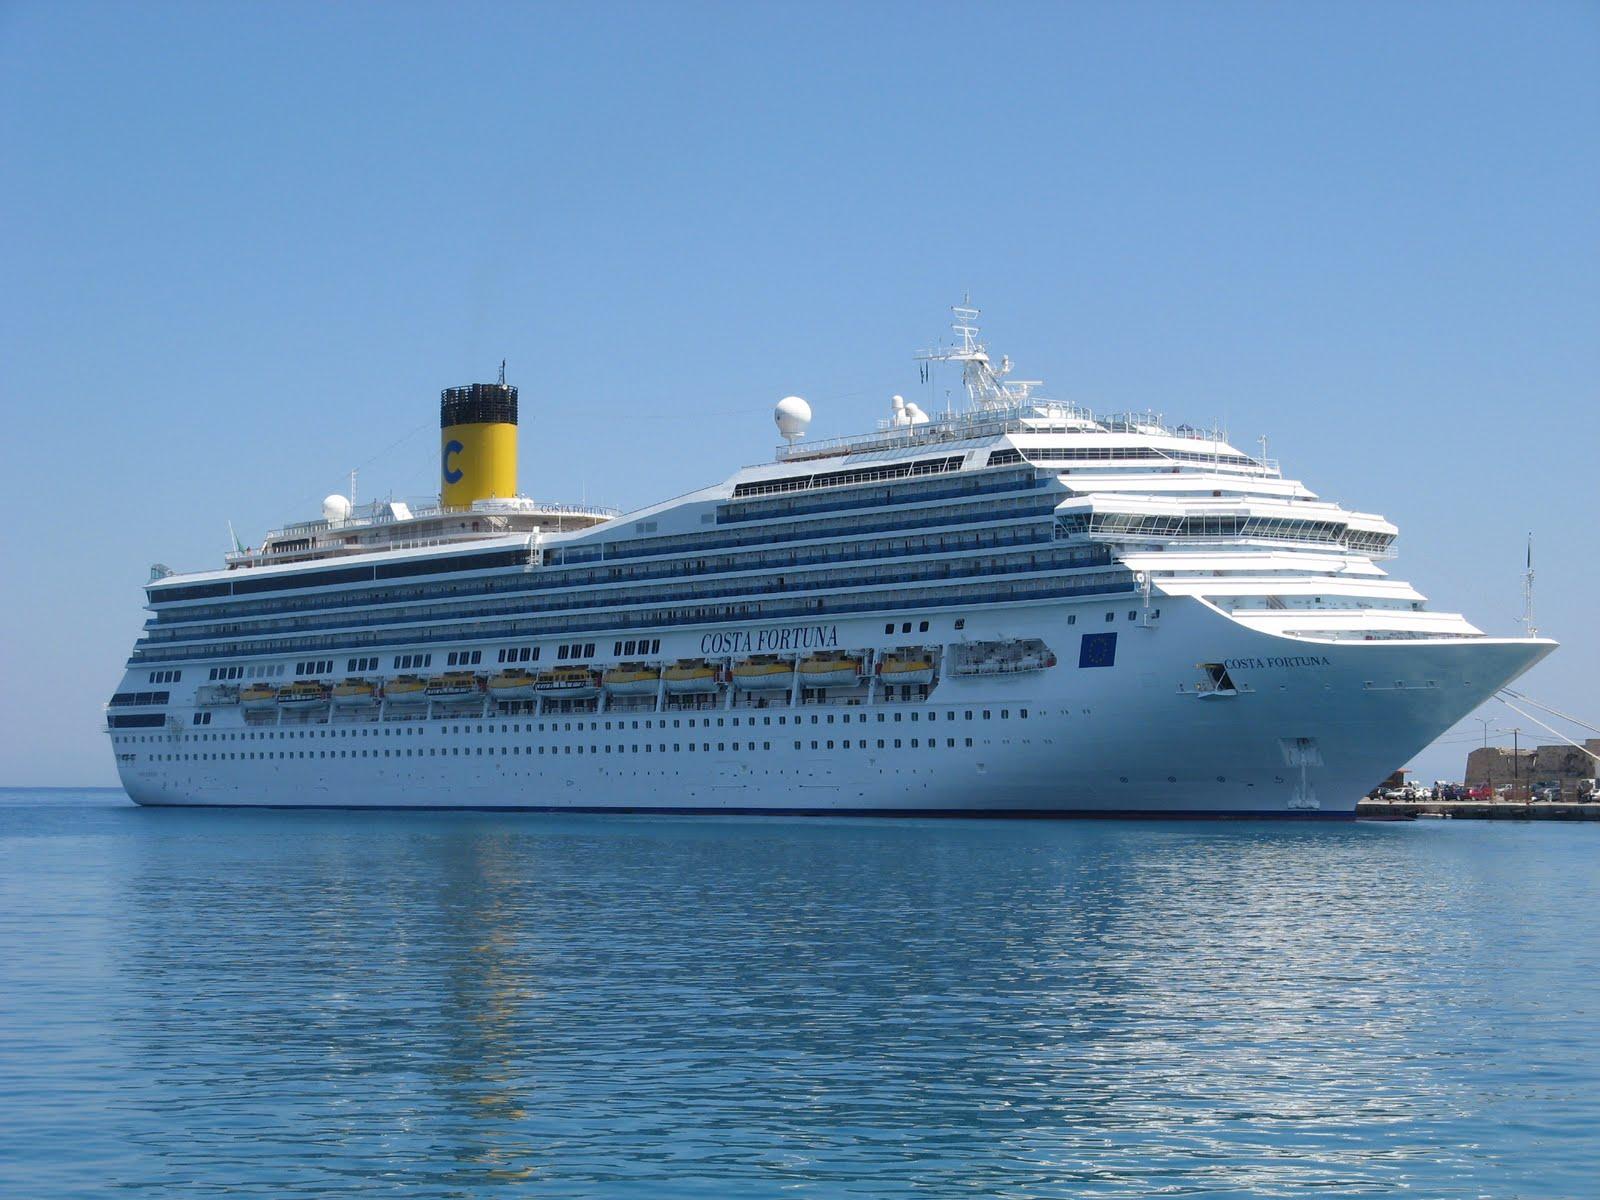 Itinerario crociera mediterraneo costa fortuna viaggiamo for Cabina interna su una nave da crociera